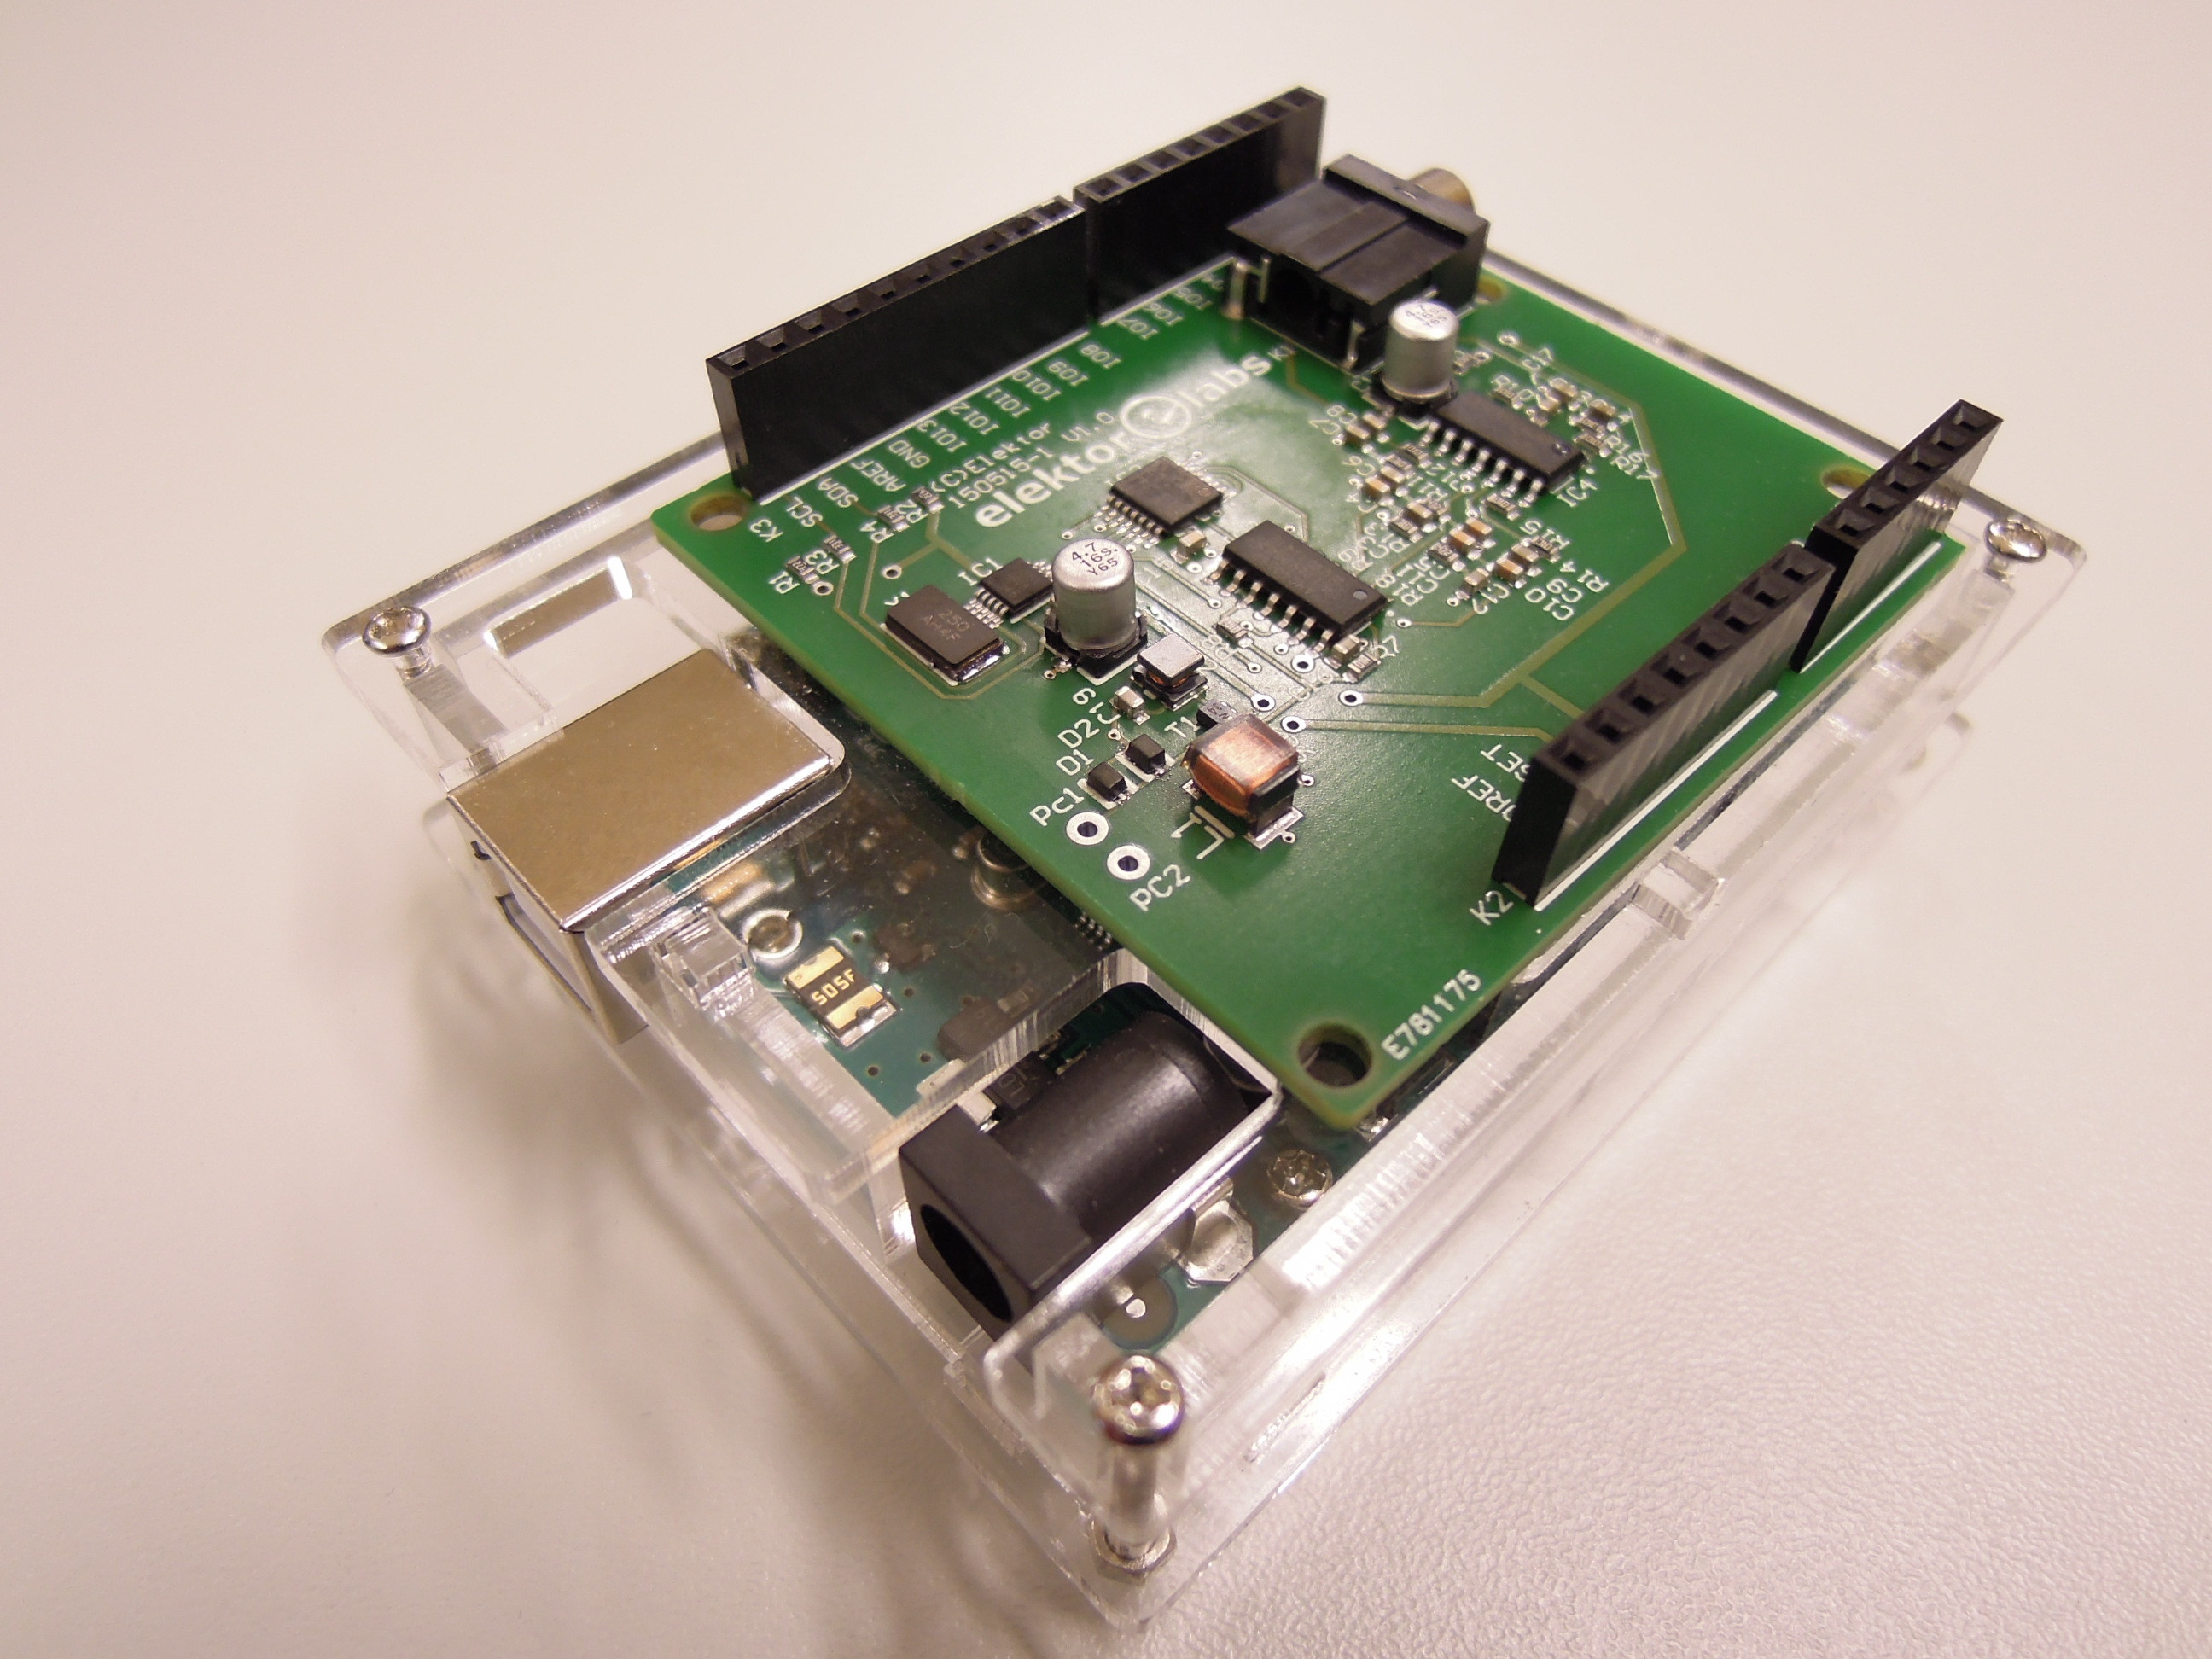 Software Defined Radio (SDR) shield for Arduino [150515-1] - Elektor